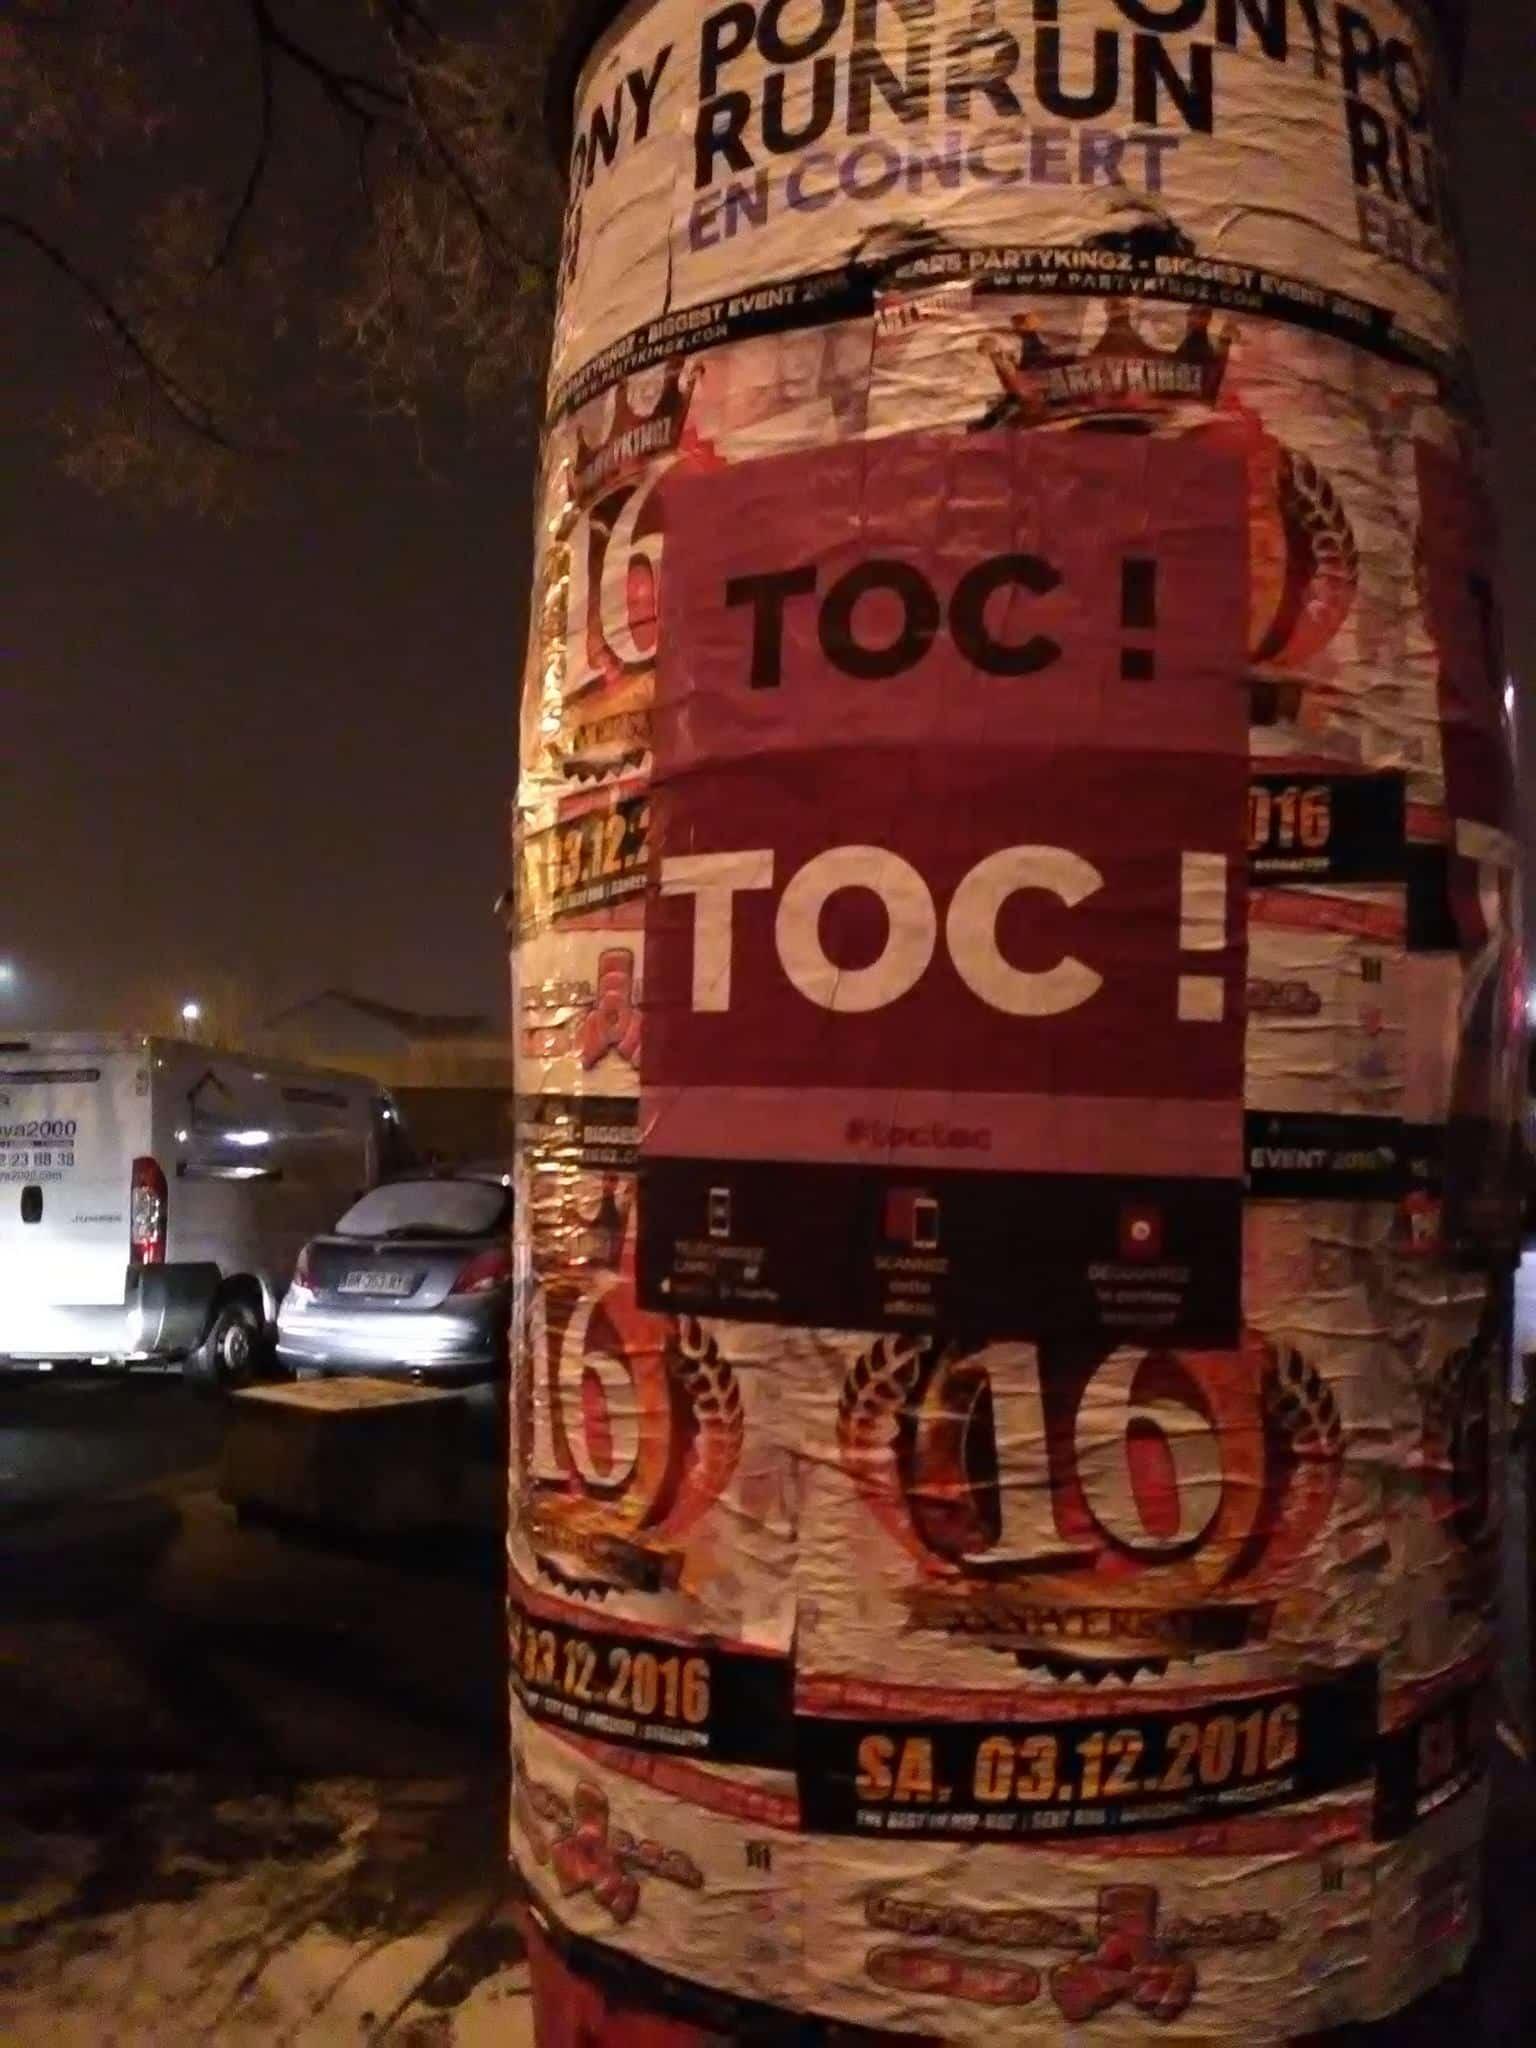 toctoccolmar3